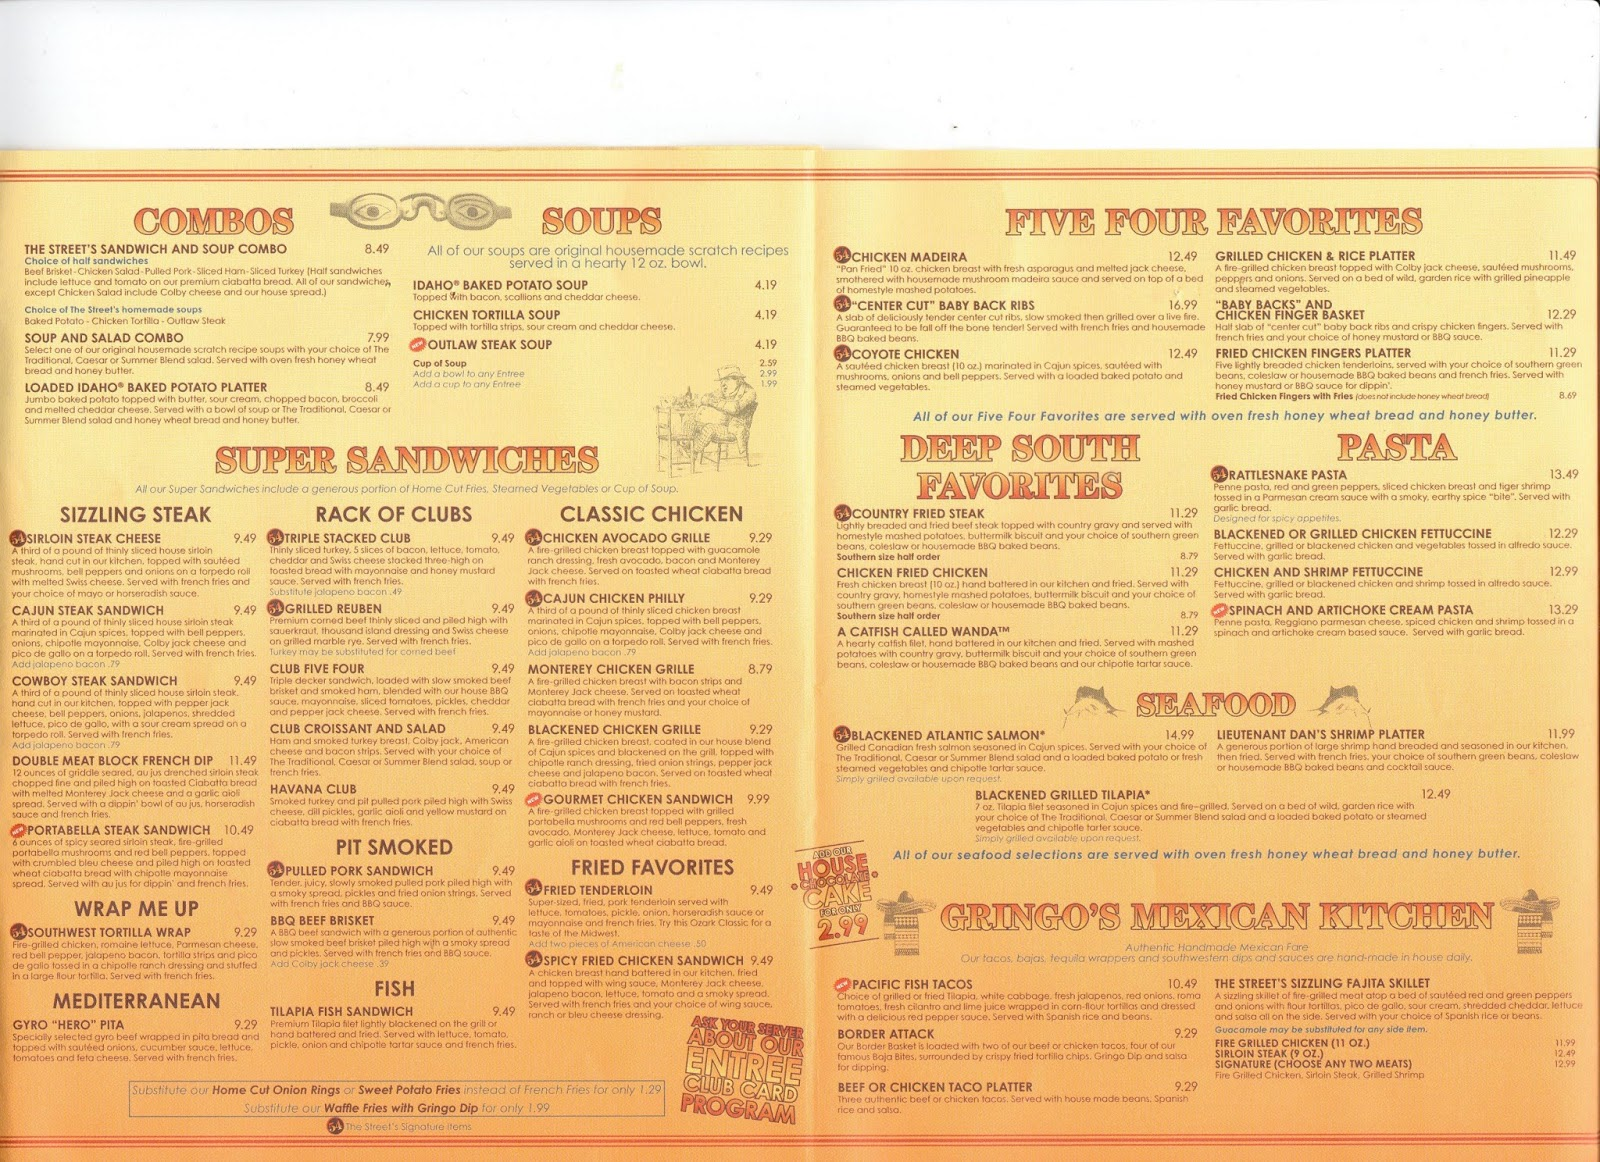 vc menu: 54th street grill - kansas city mo, st louis mo, olathe ks